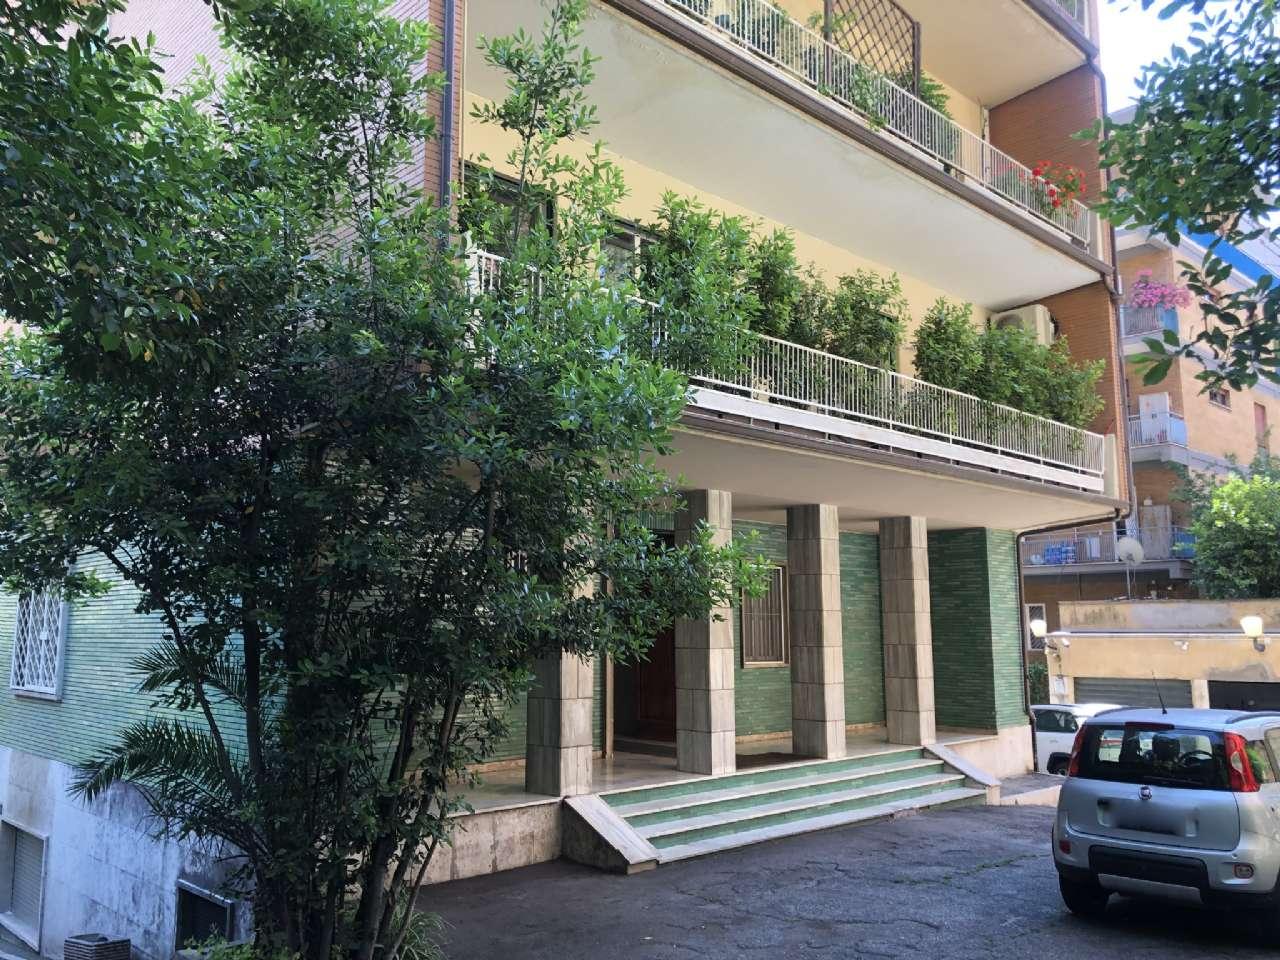 Appartamento, Via dei Monti Parioli, Roma, foto 19